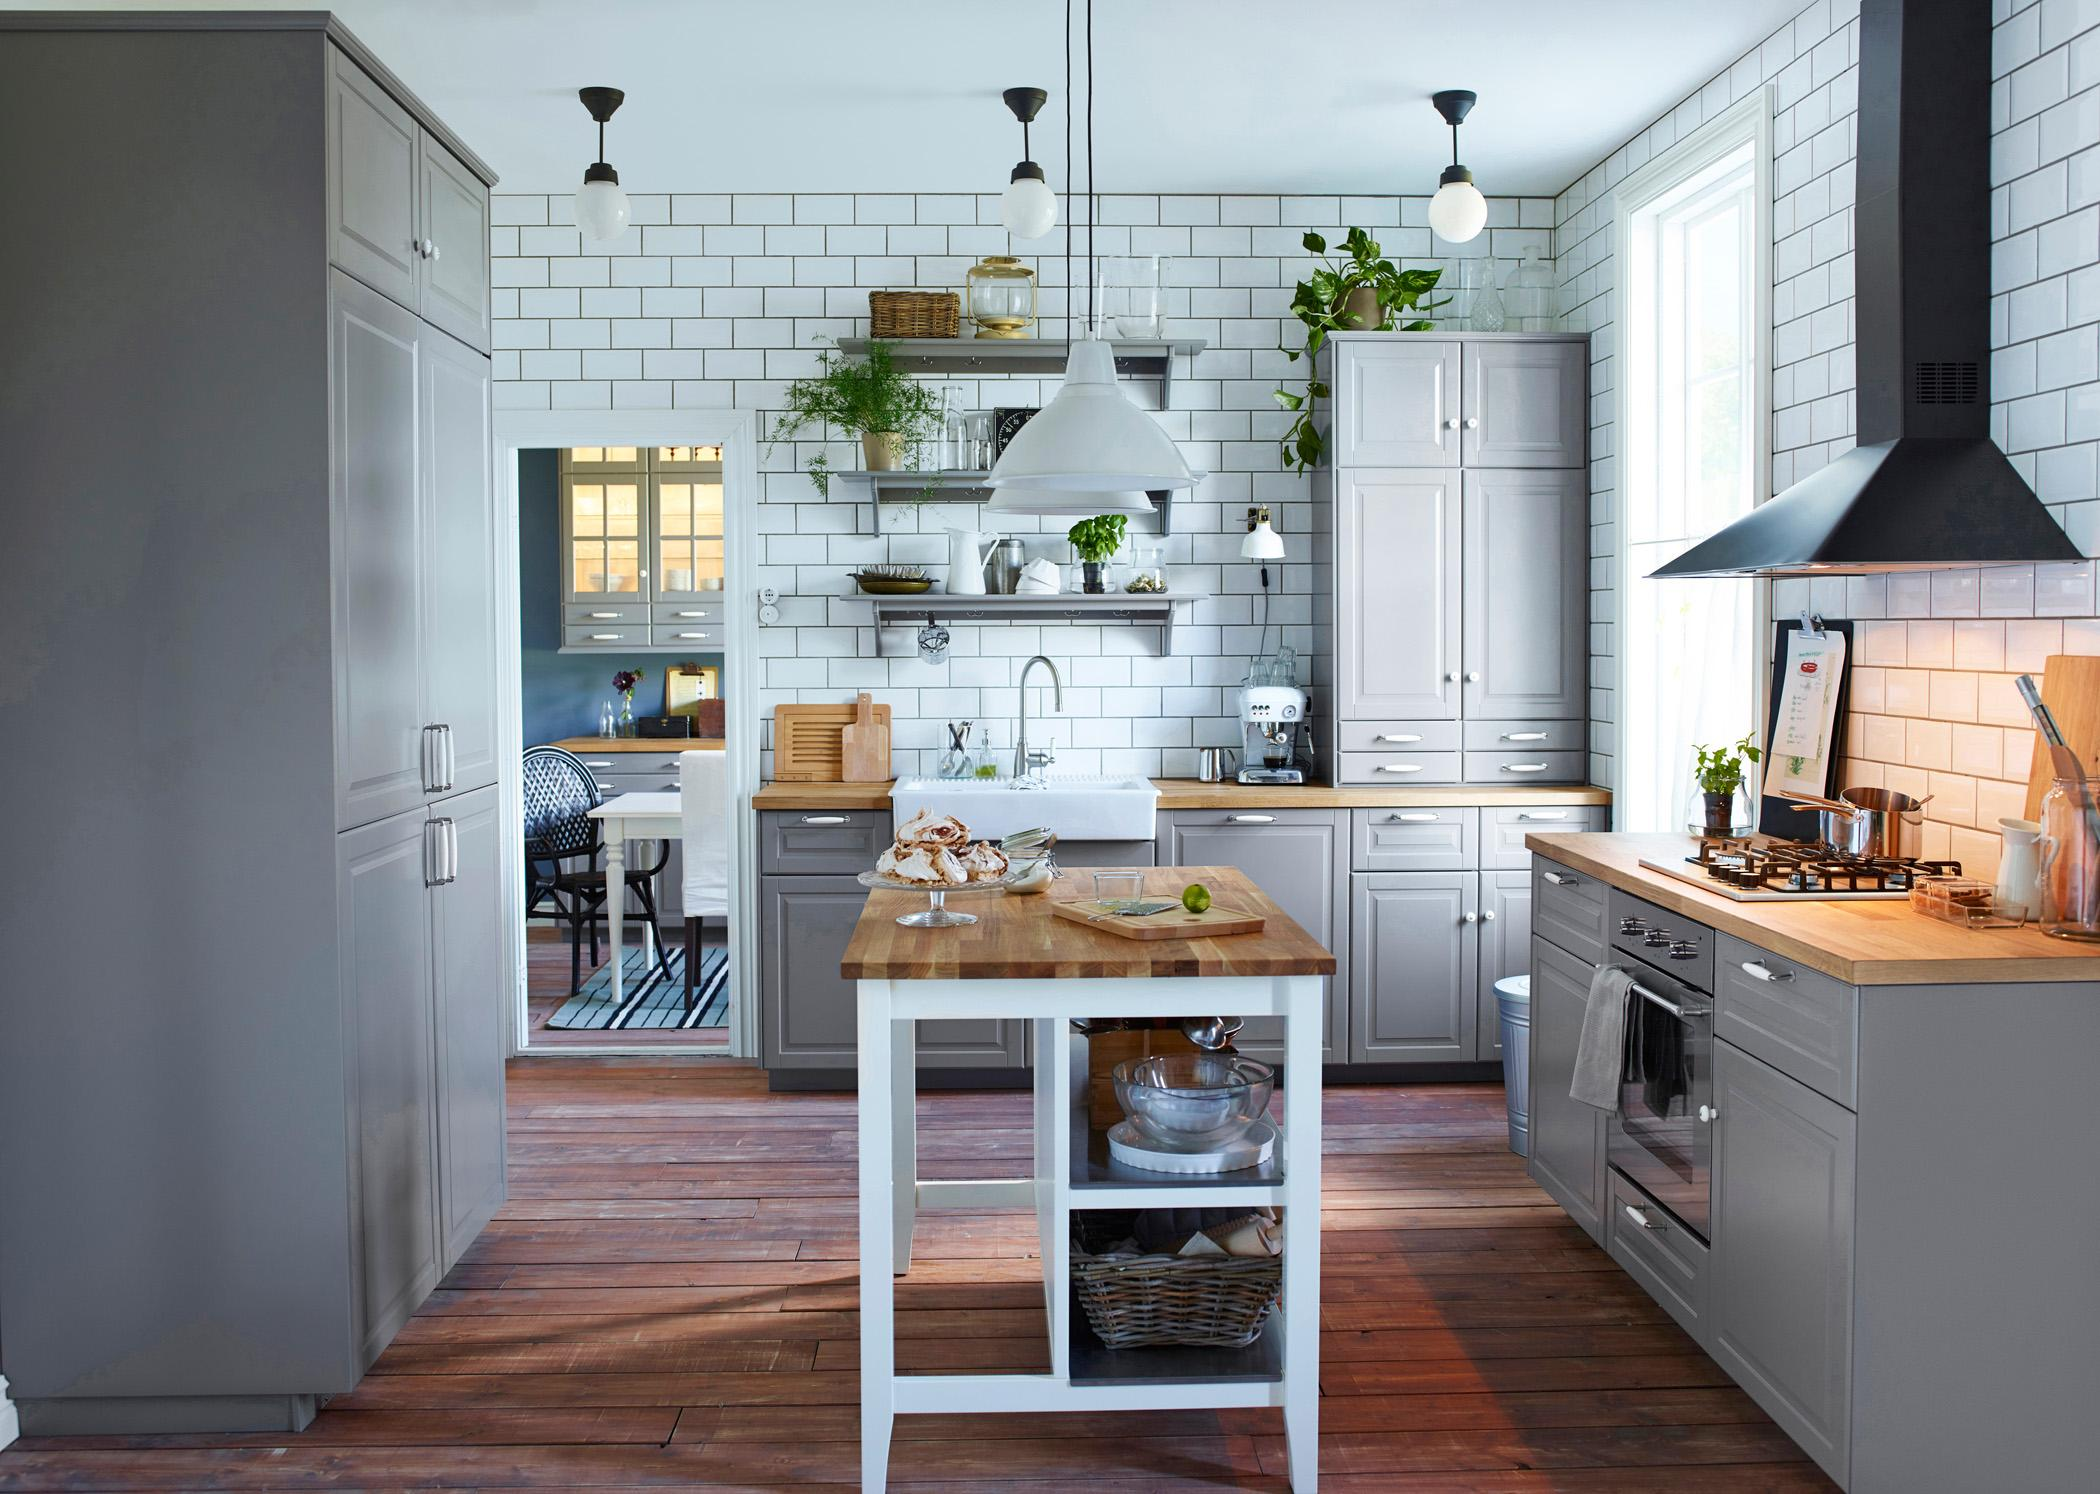 Metro fliesen küche  Metrofliesen • Bilder & Ideen • COUCHstyle